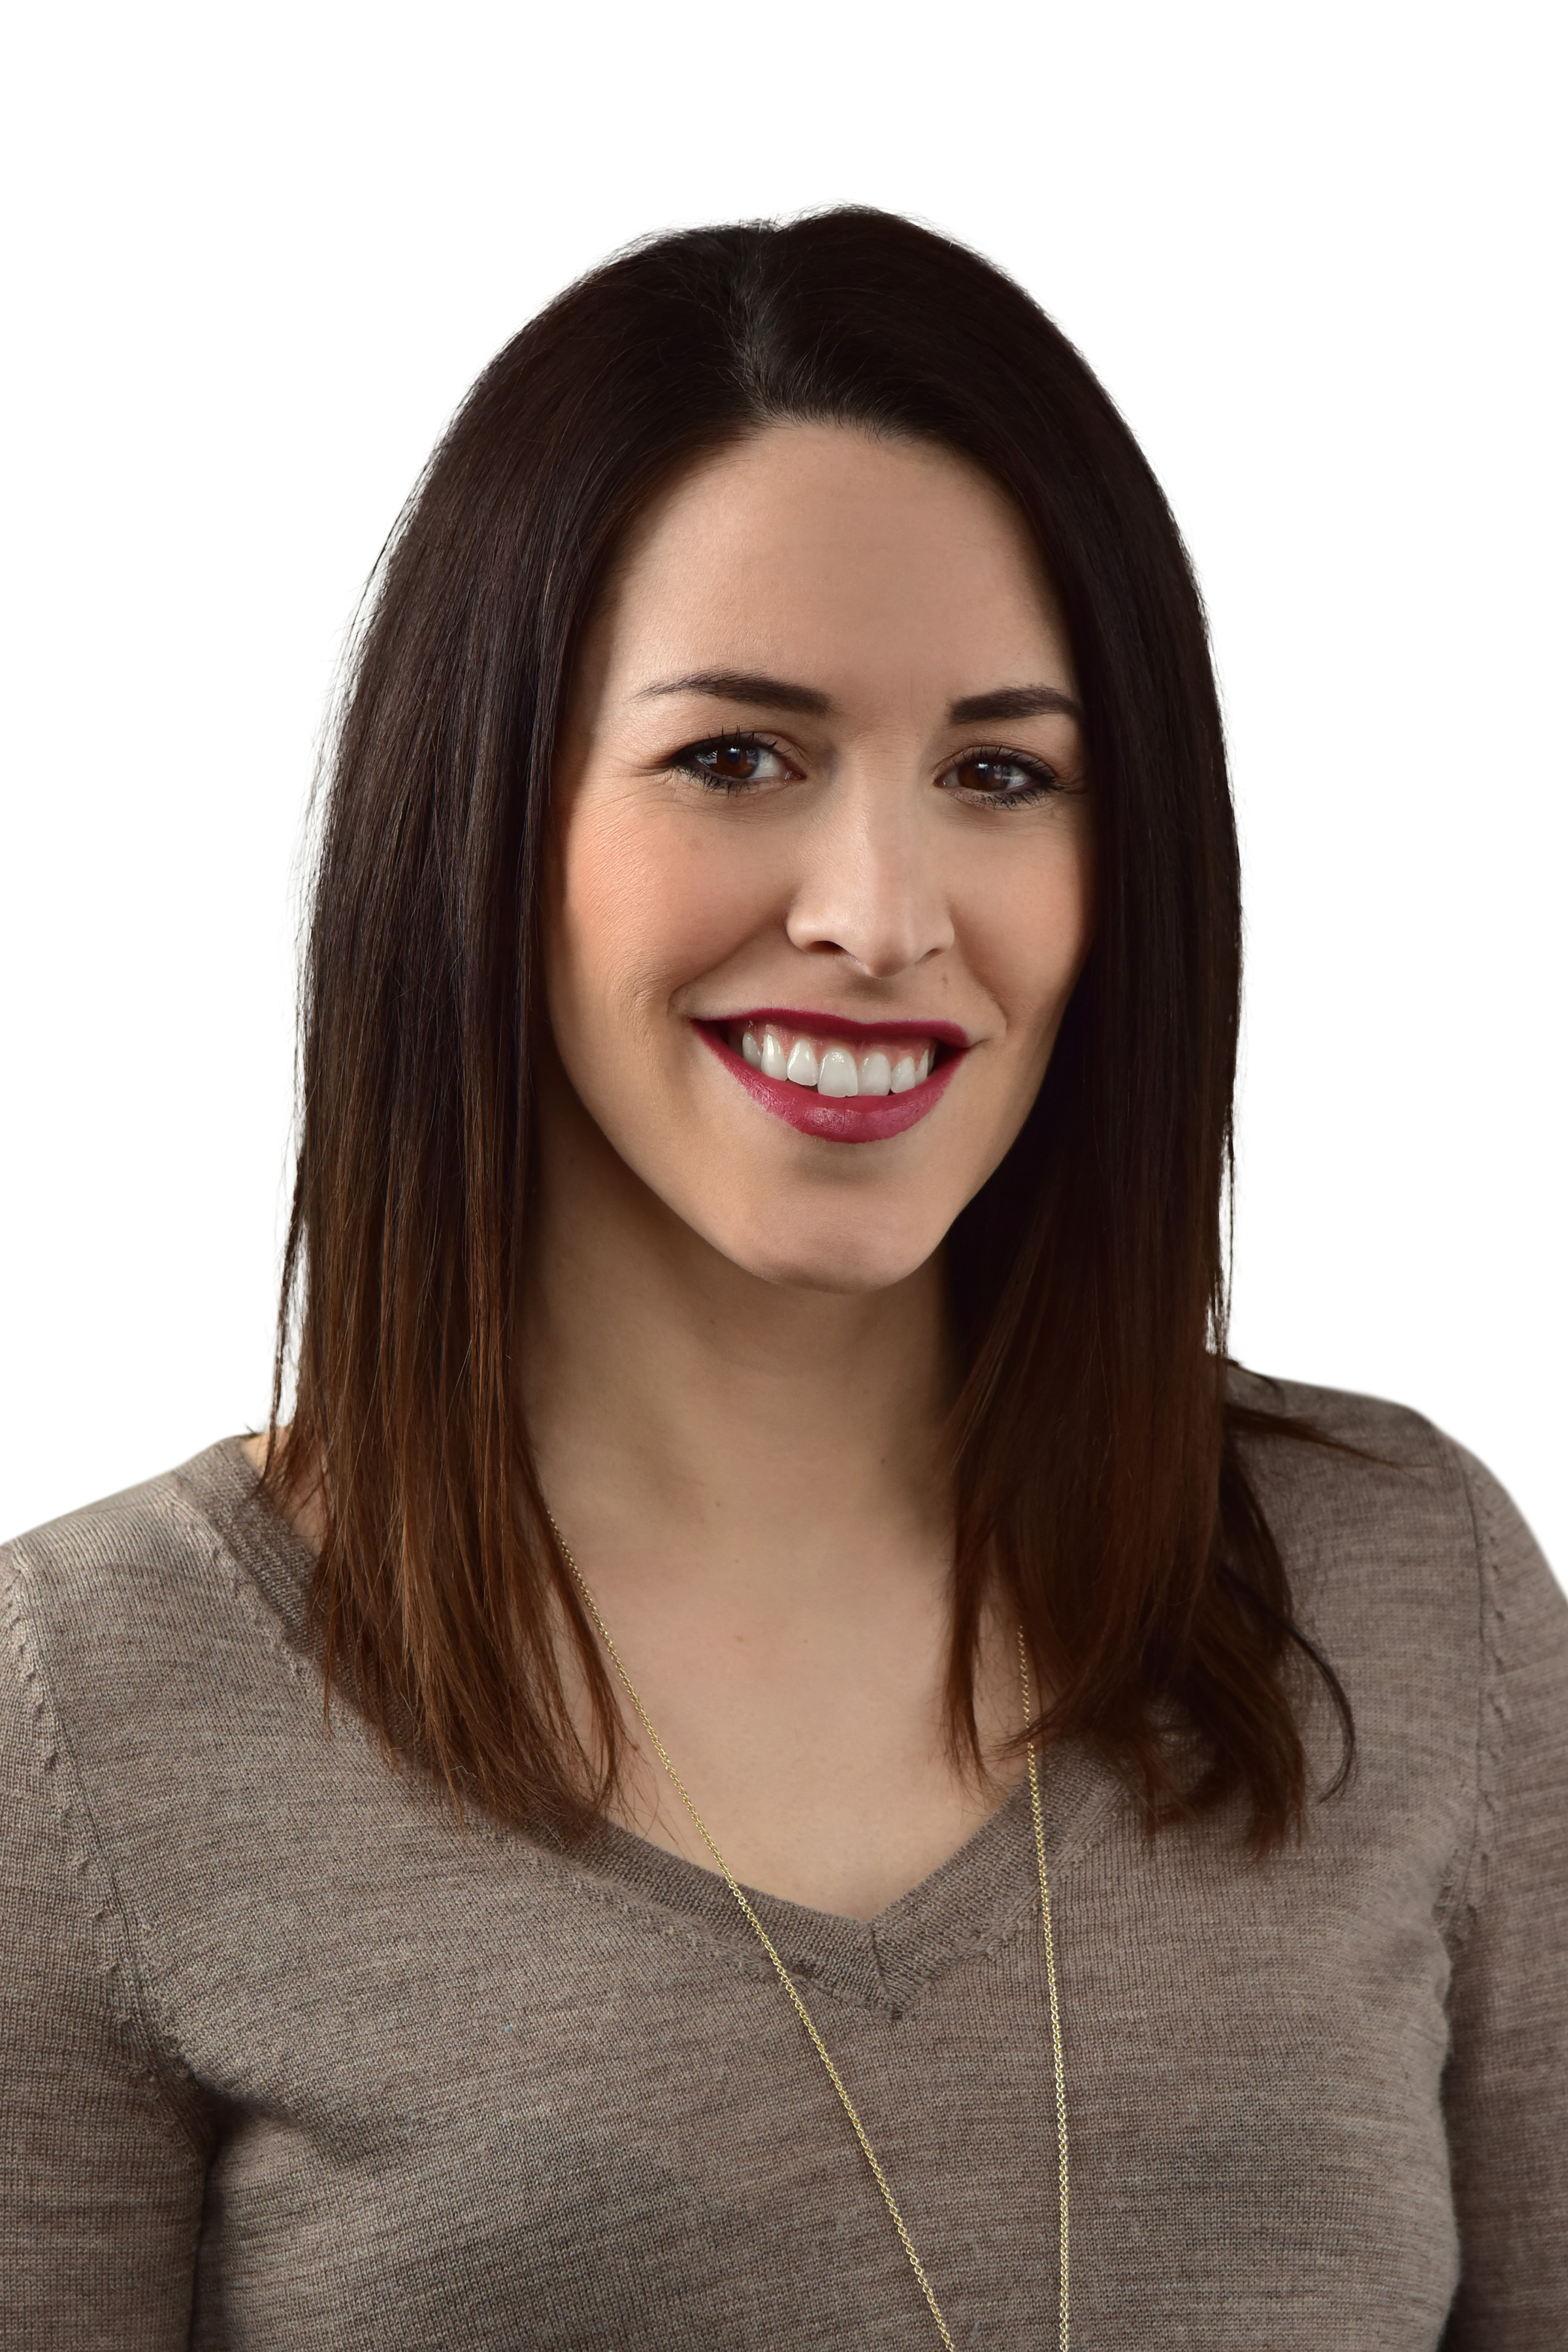 Danielle undefined Mayo